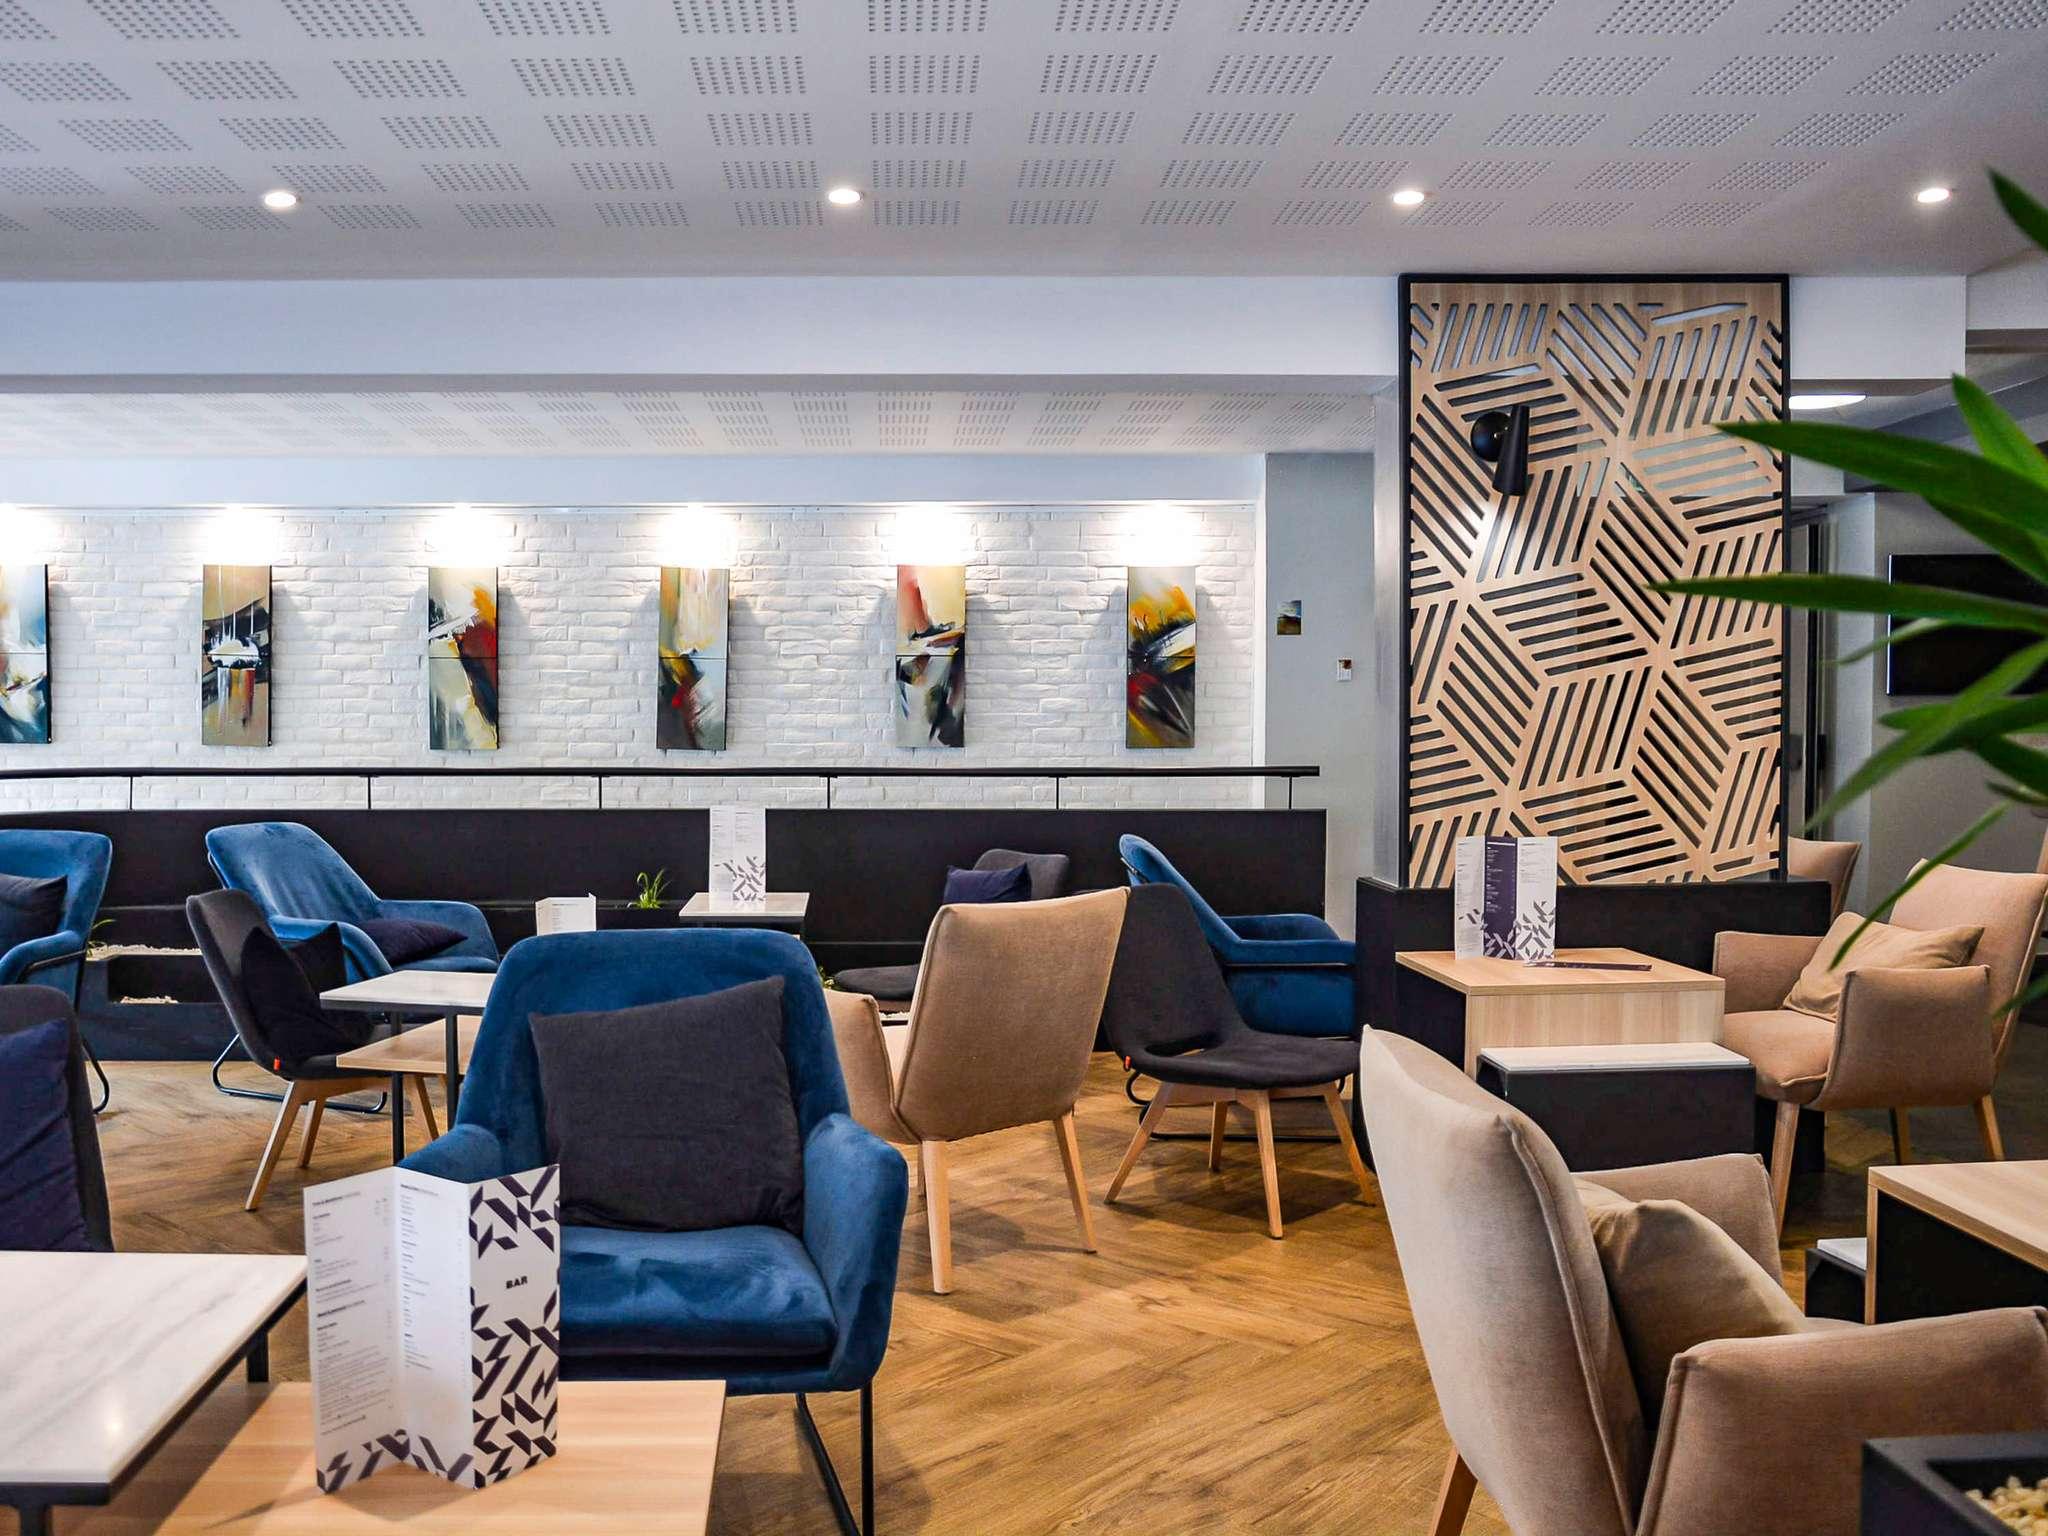 Hotel – Hotel Mercure Lorient Centro